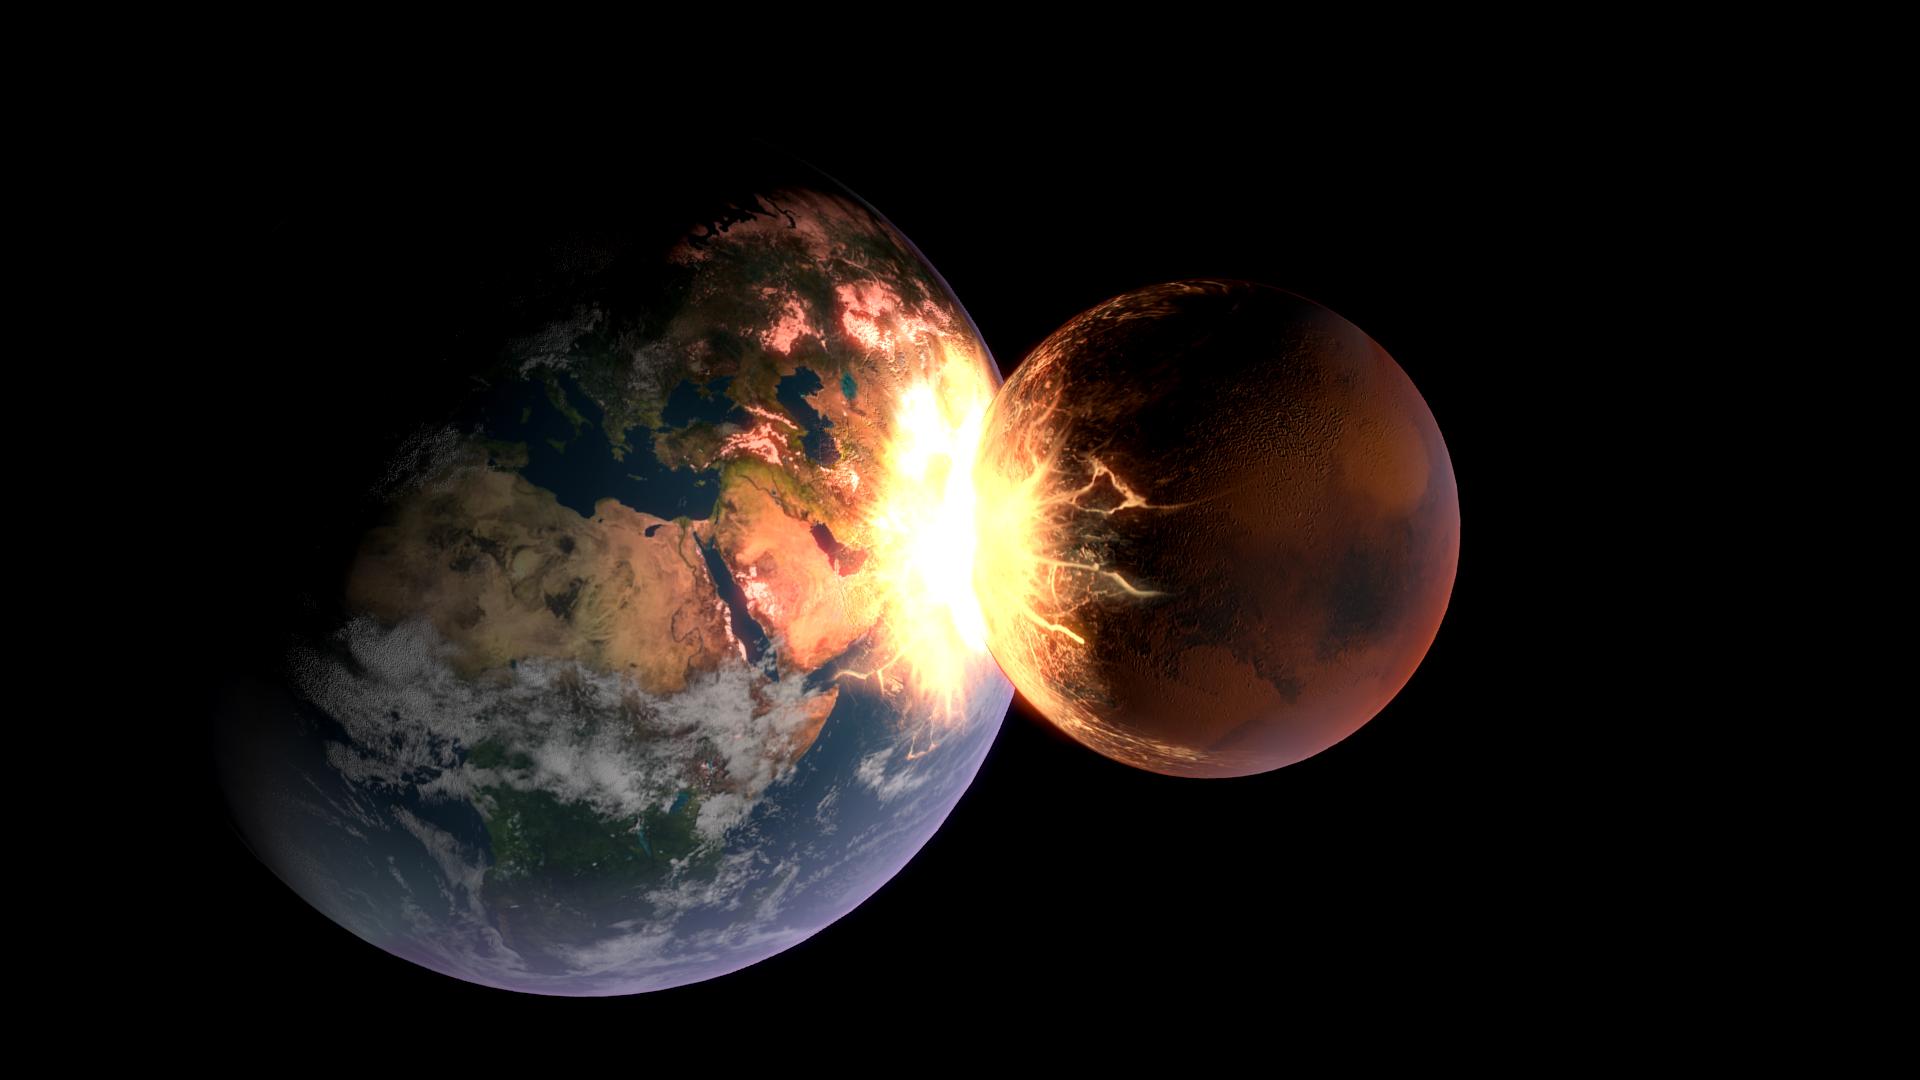 Earth vs. Mars by MestreEliam on DeviantArt